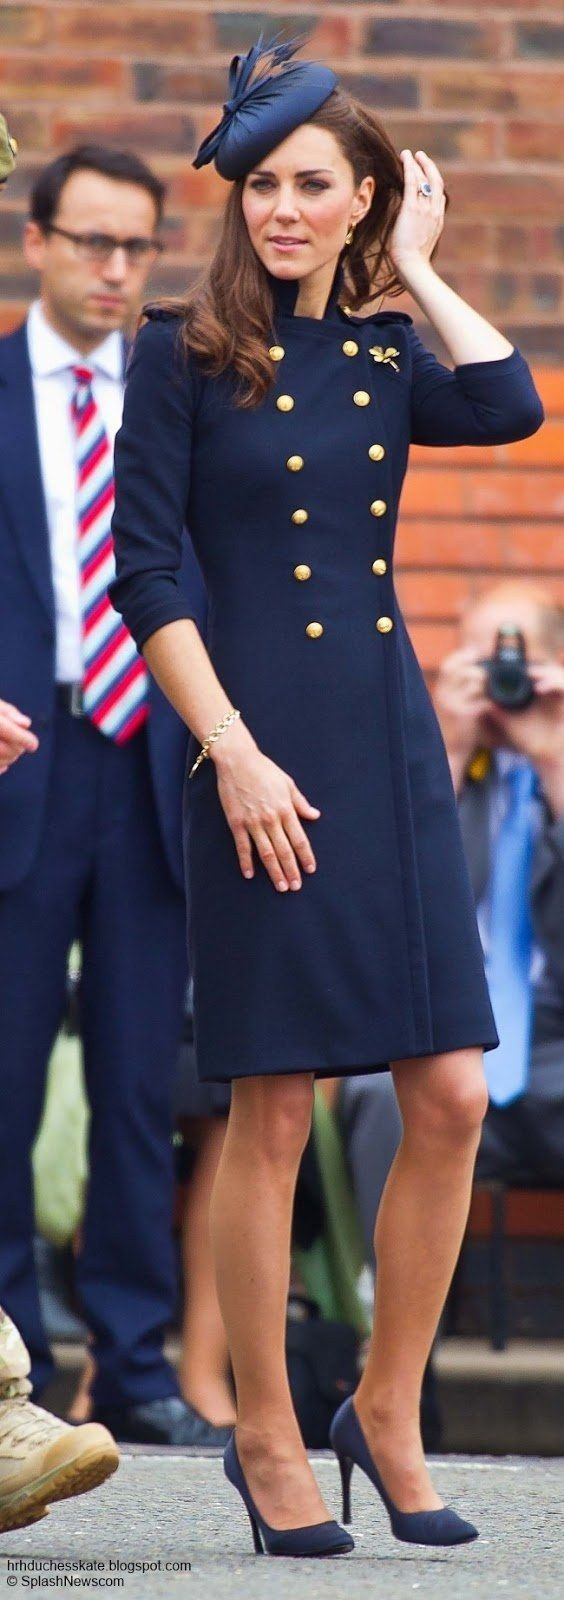 Kate Middleton Wearing Hats - As Found On Pinterest